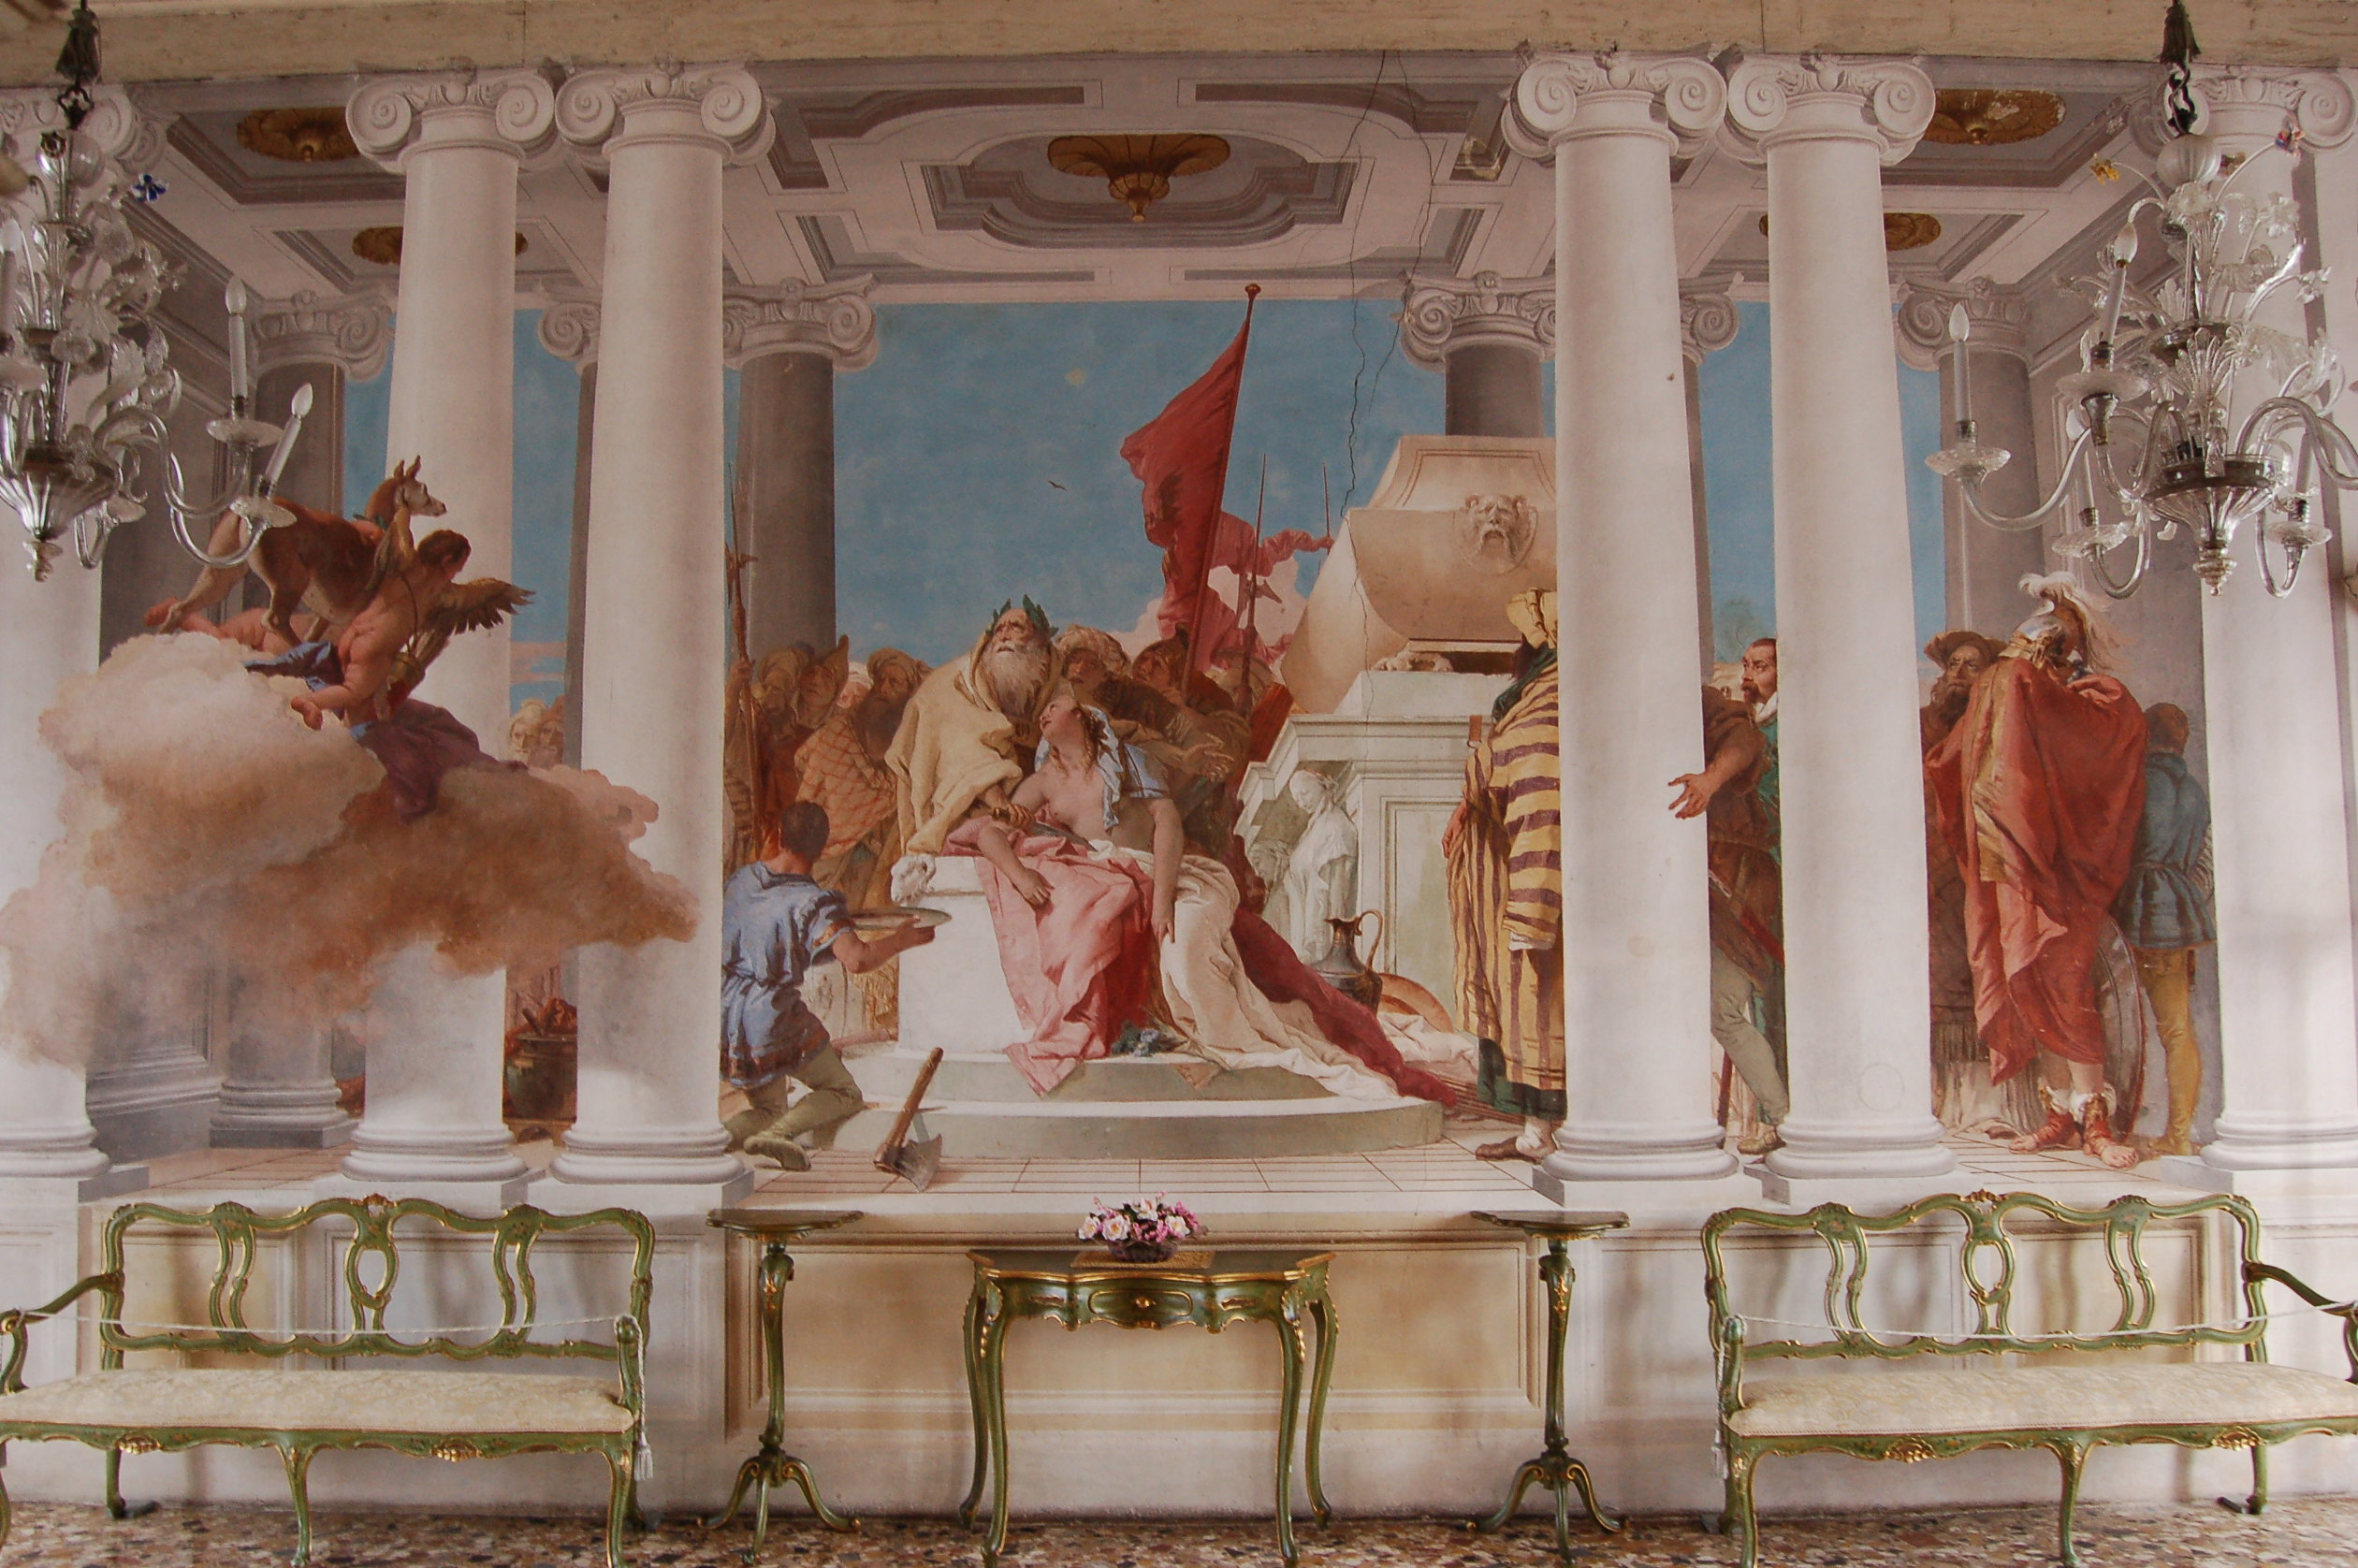 Visite guidate affreschi e pittura veneta Tiepolo